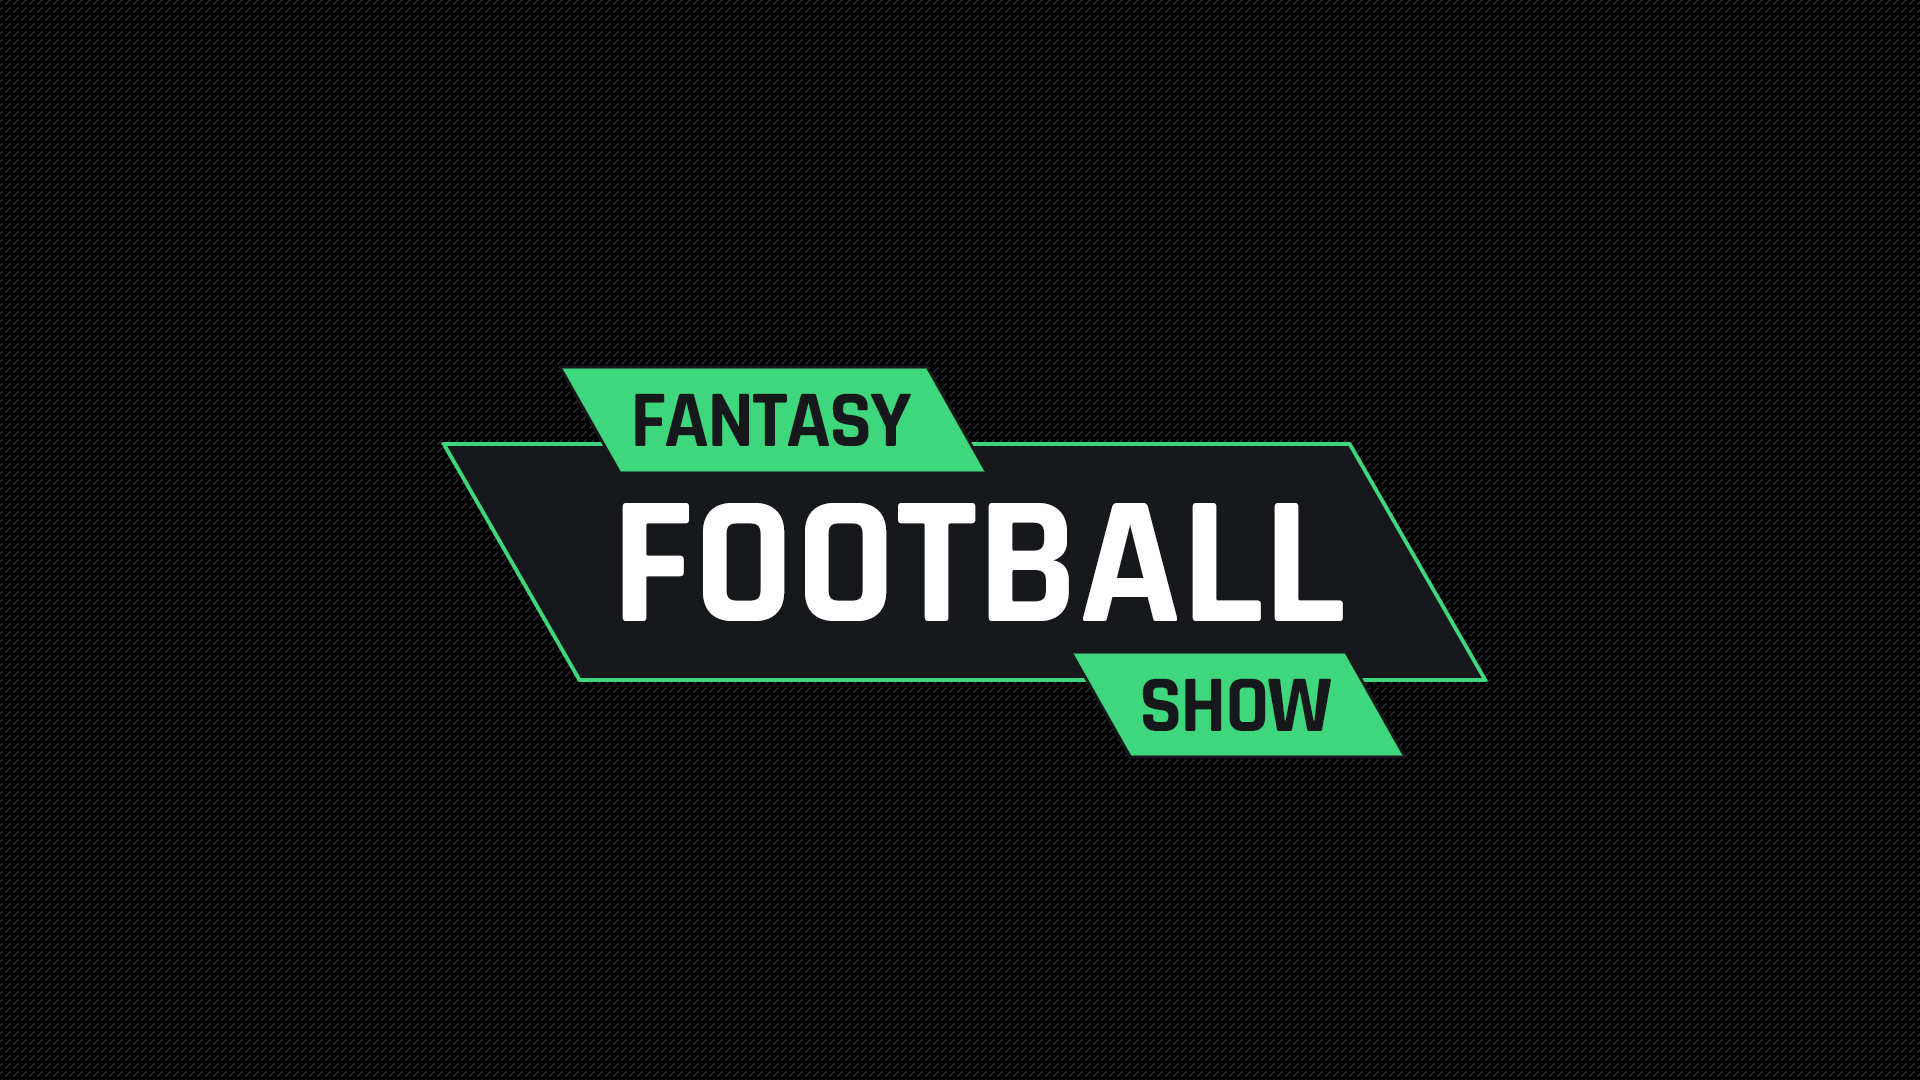 Fantasy Football Show Podcast Week 12: Waiver pickups, sleepers, start 'em/sit 'em advice